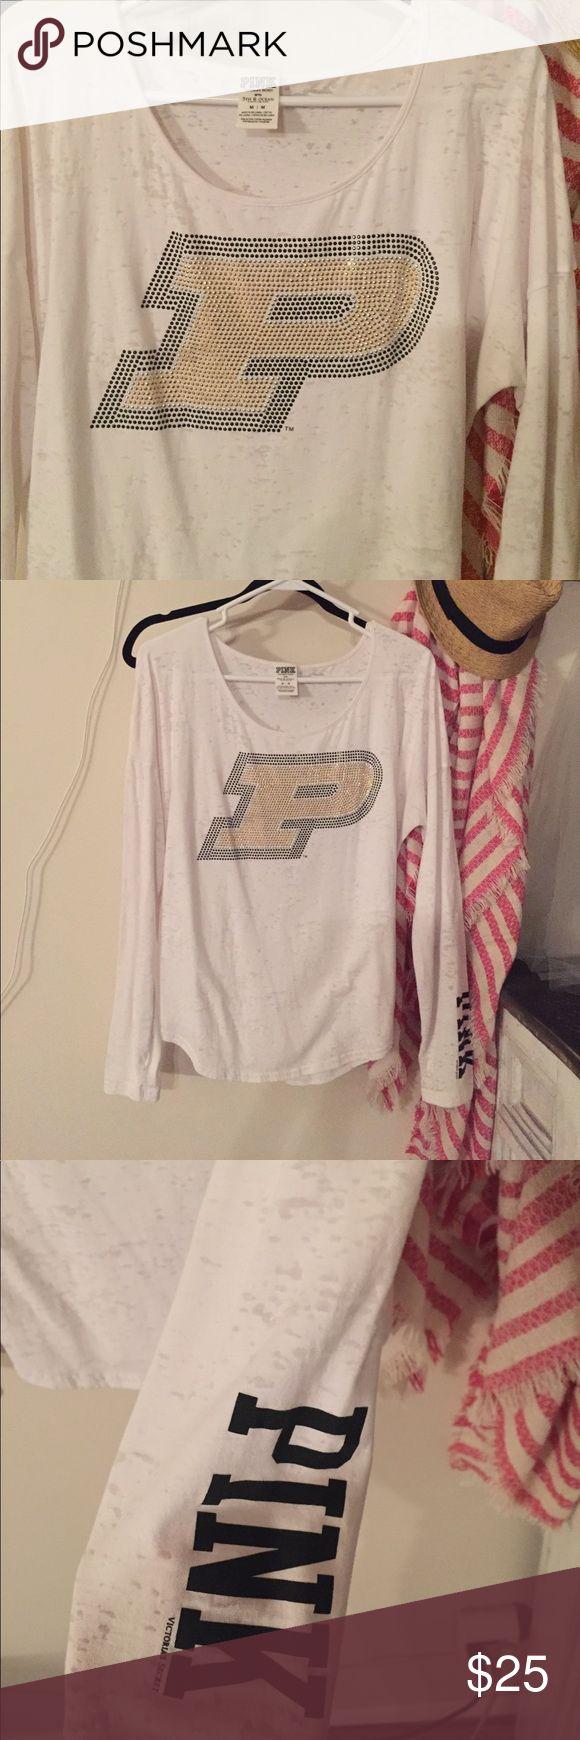 Color printing purdue - Purdue Vs Pink Burnout Tee White M